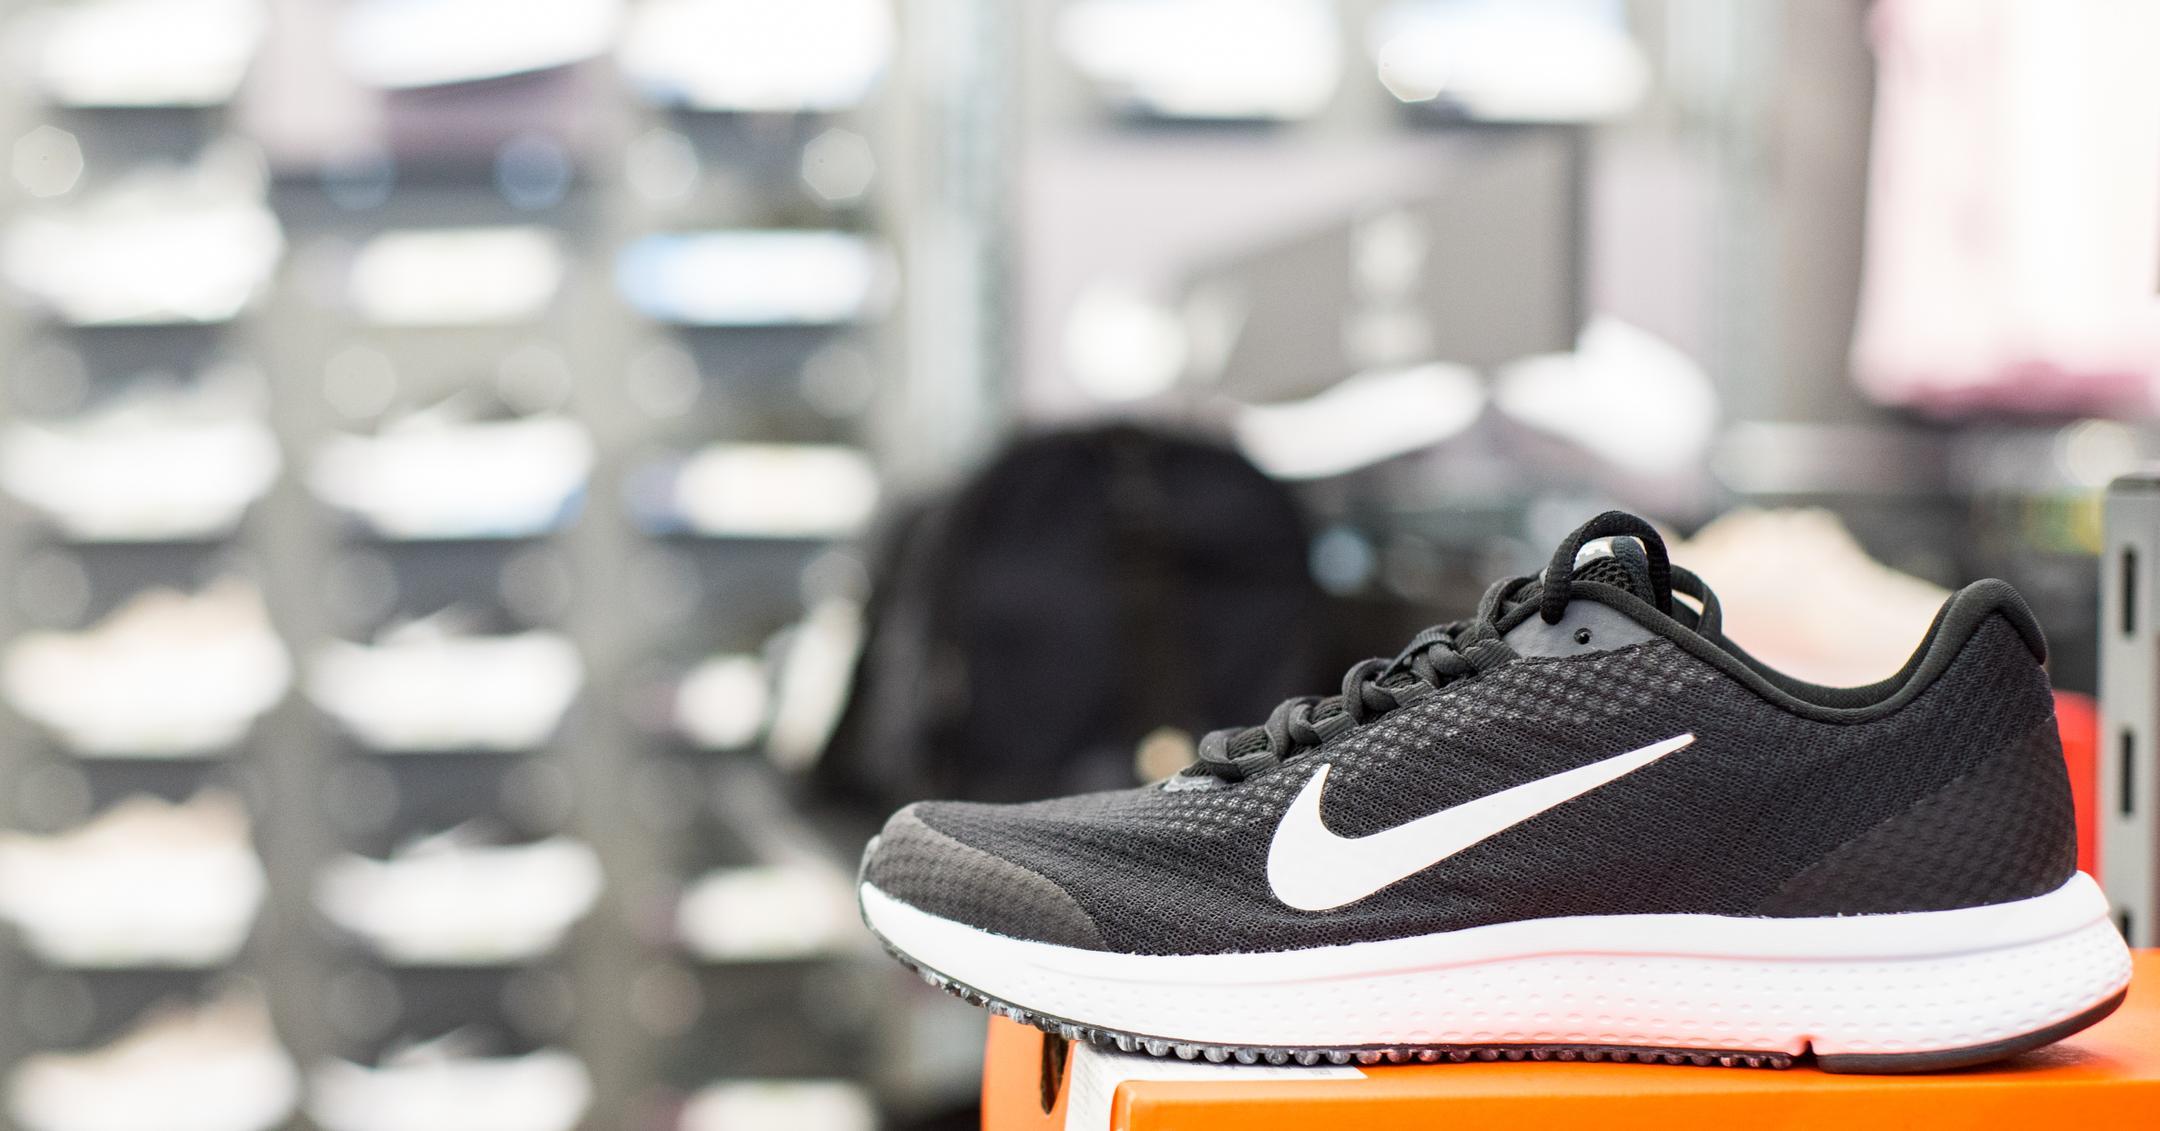 maestría Odia Mezclado  Analysis of the distribution and retail strategy of sneaker giant Nike